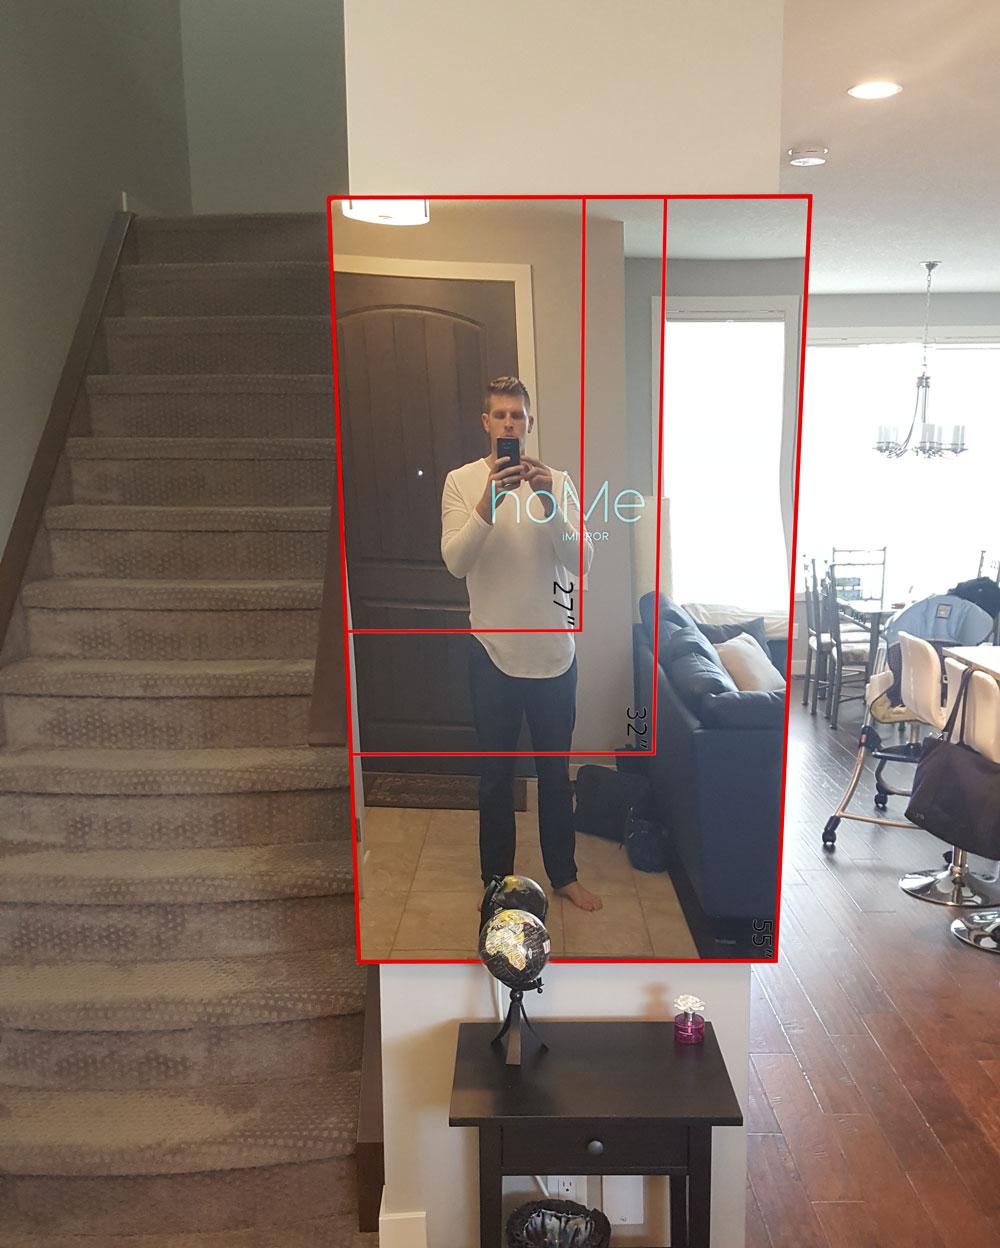 Dimensions-hoMe.jpg